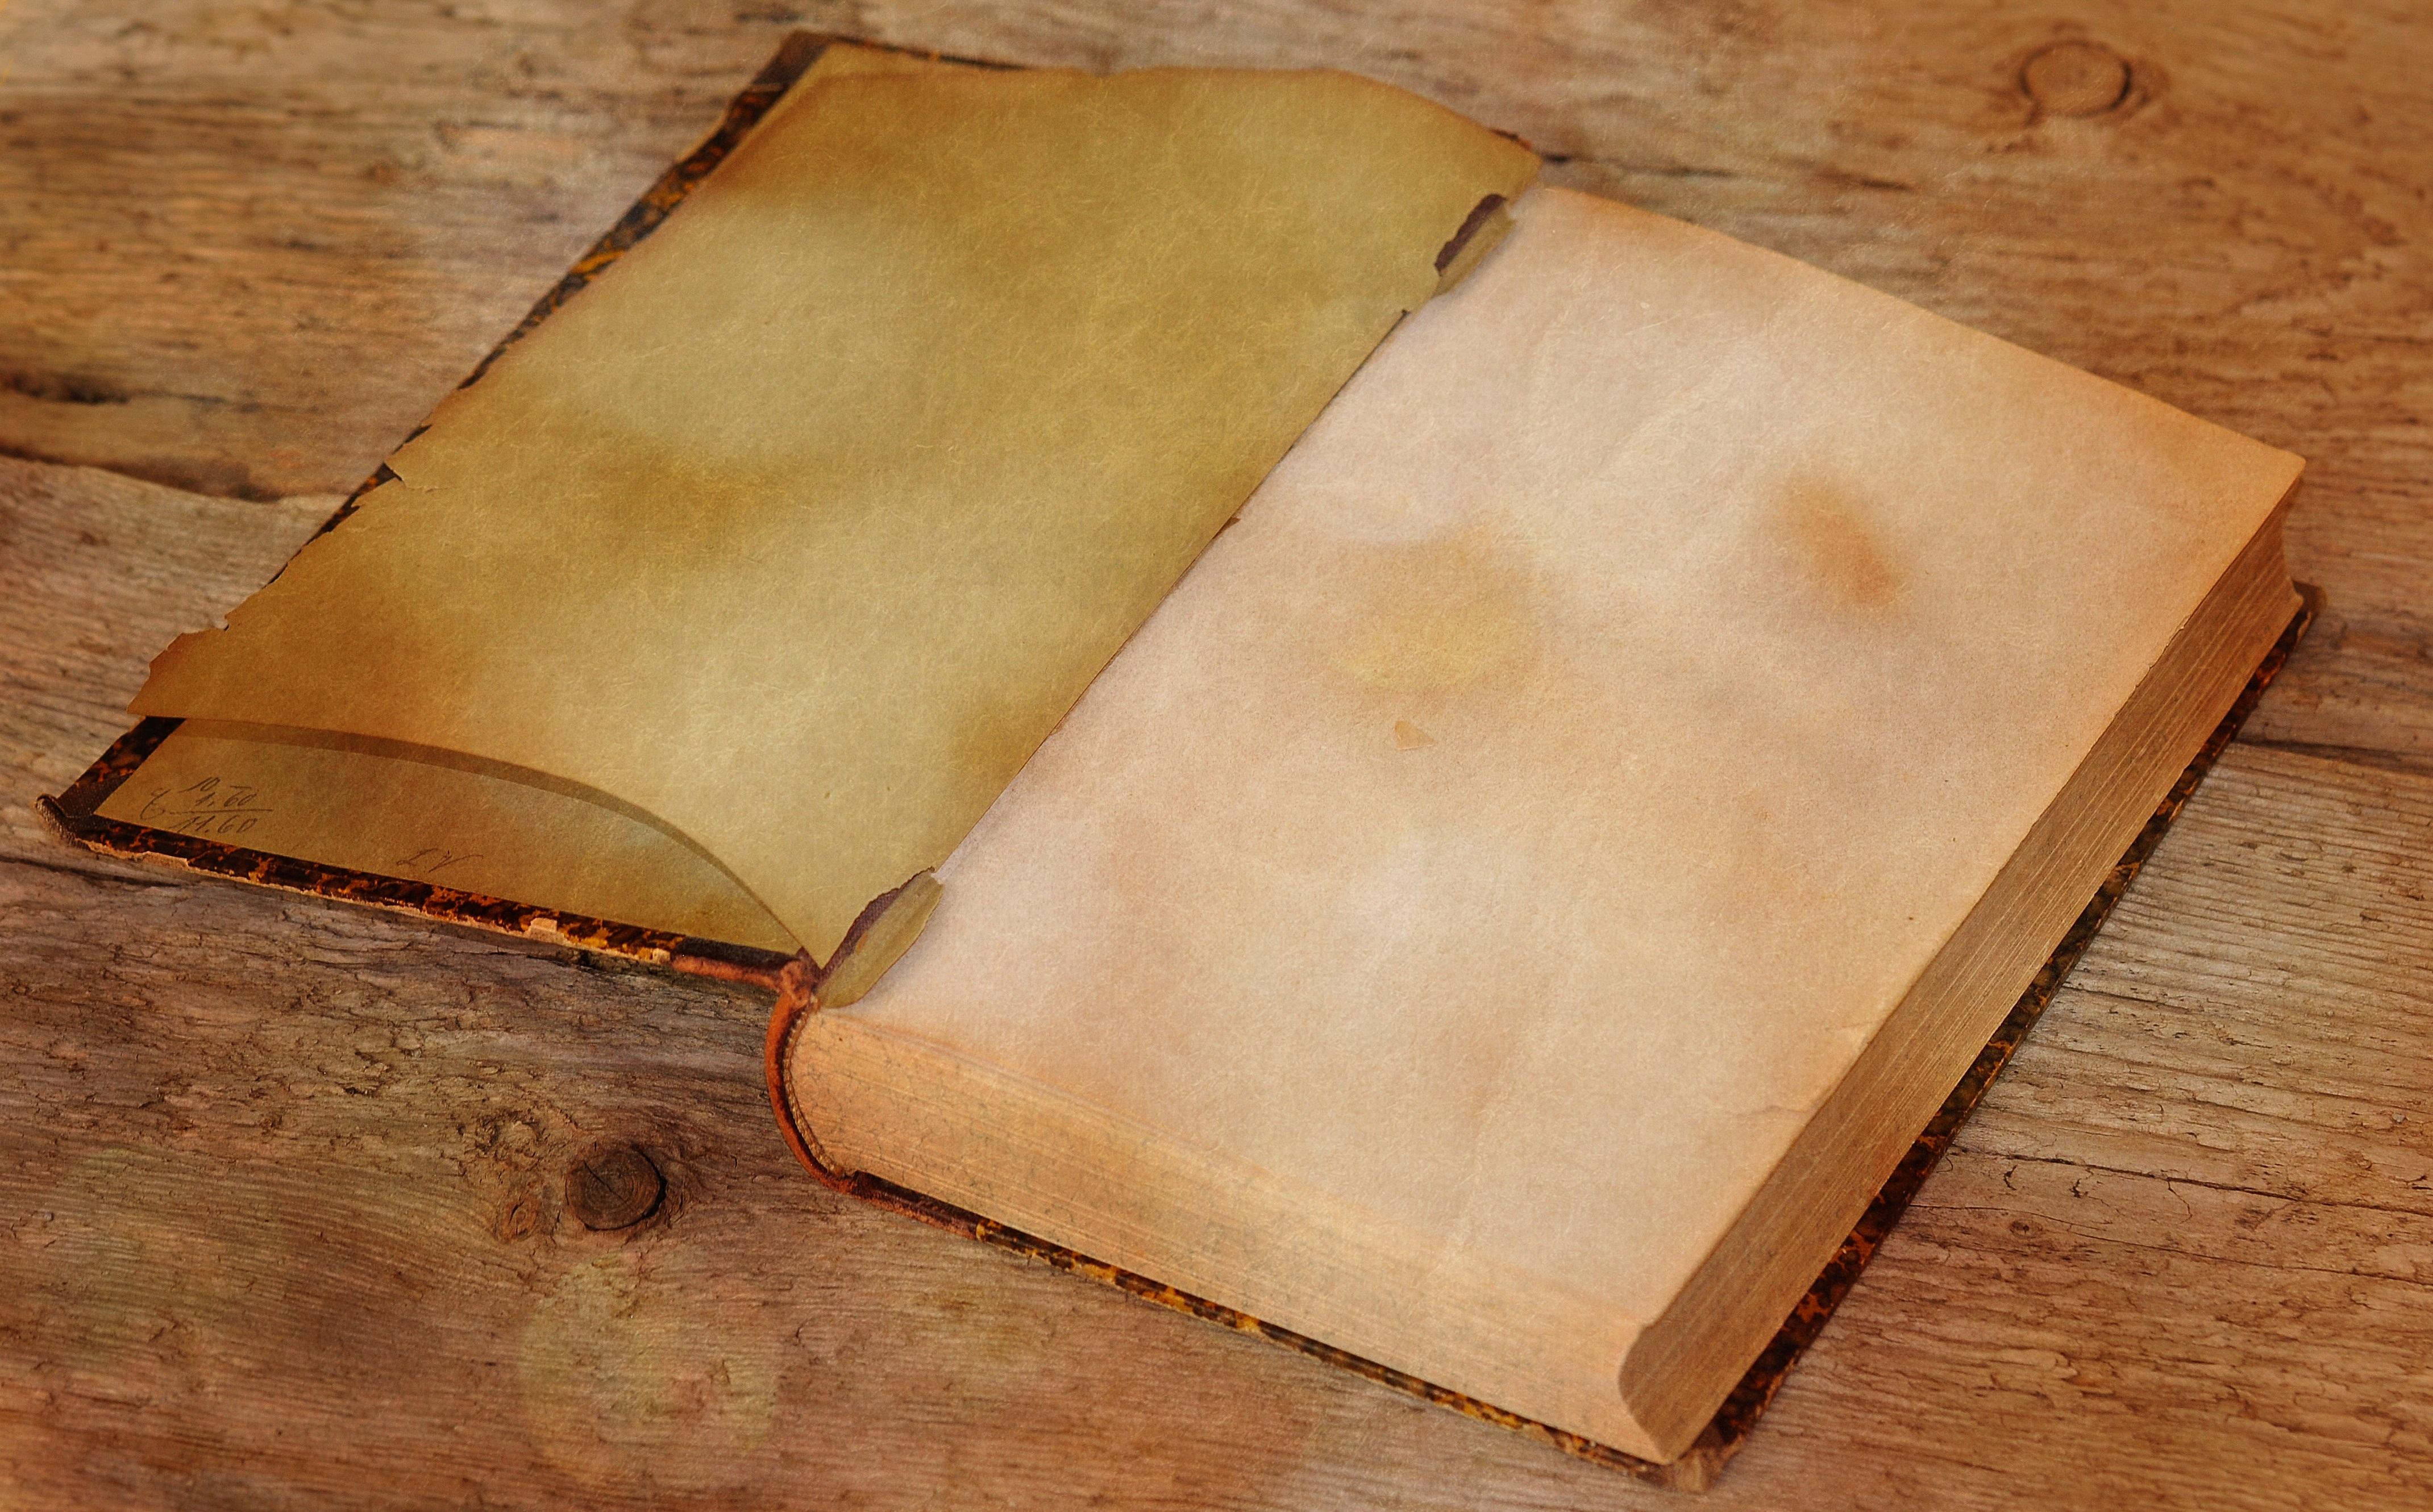 Top Free Images : book, wood, antique, floor, food, furniture, baking  UJ99